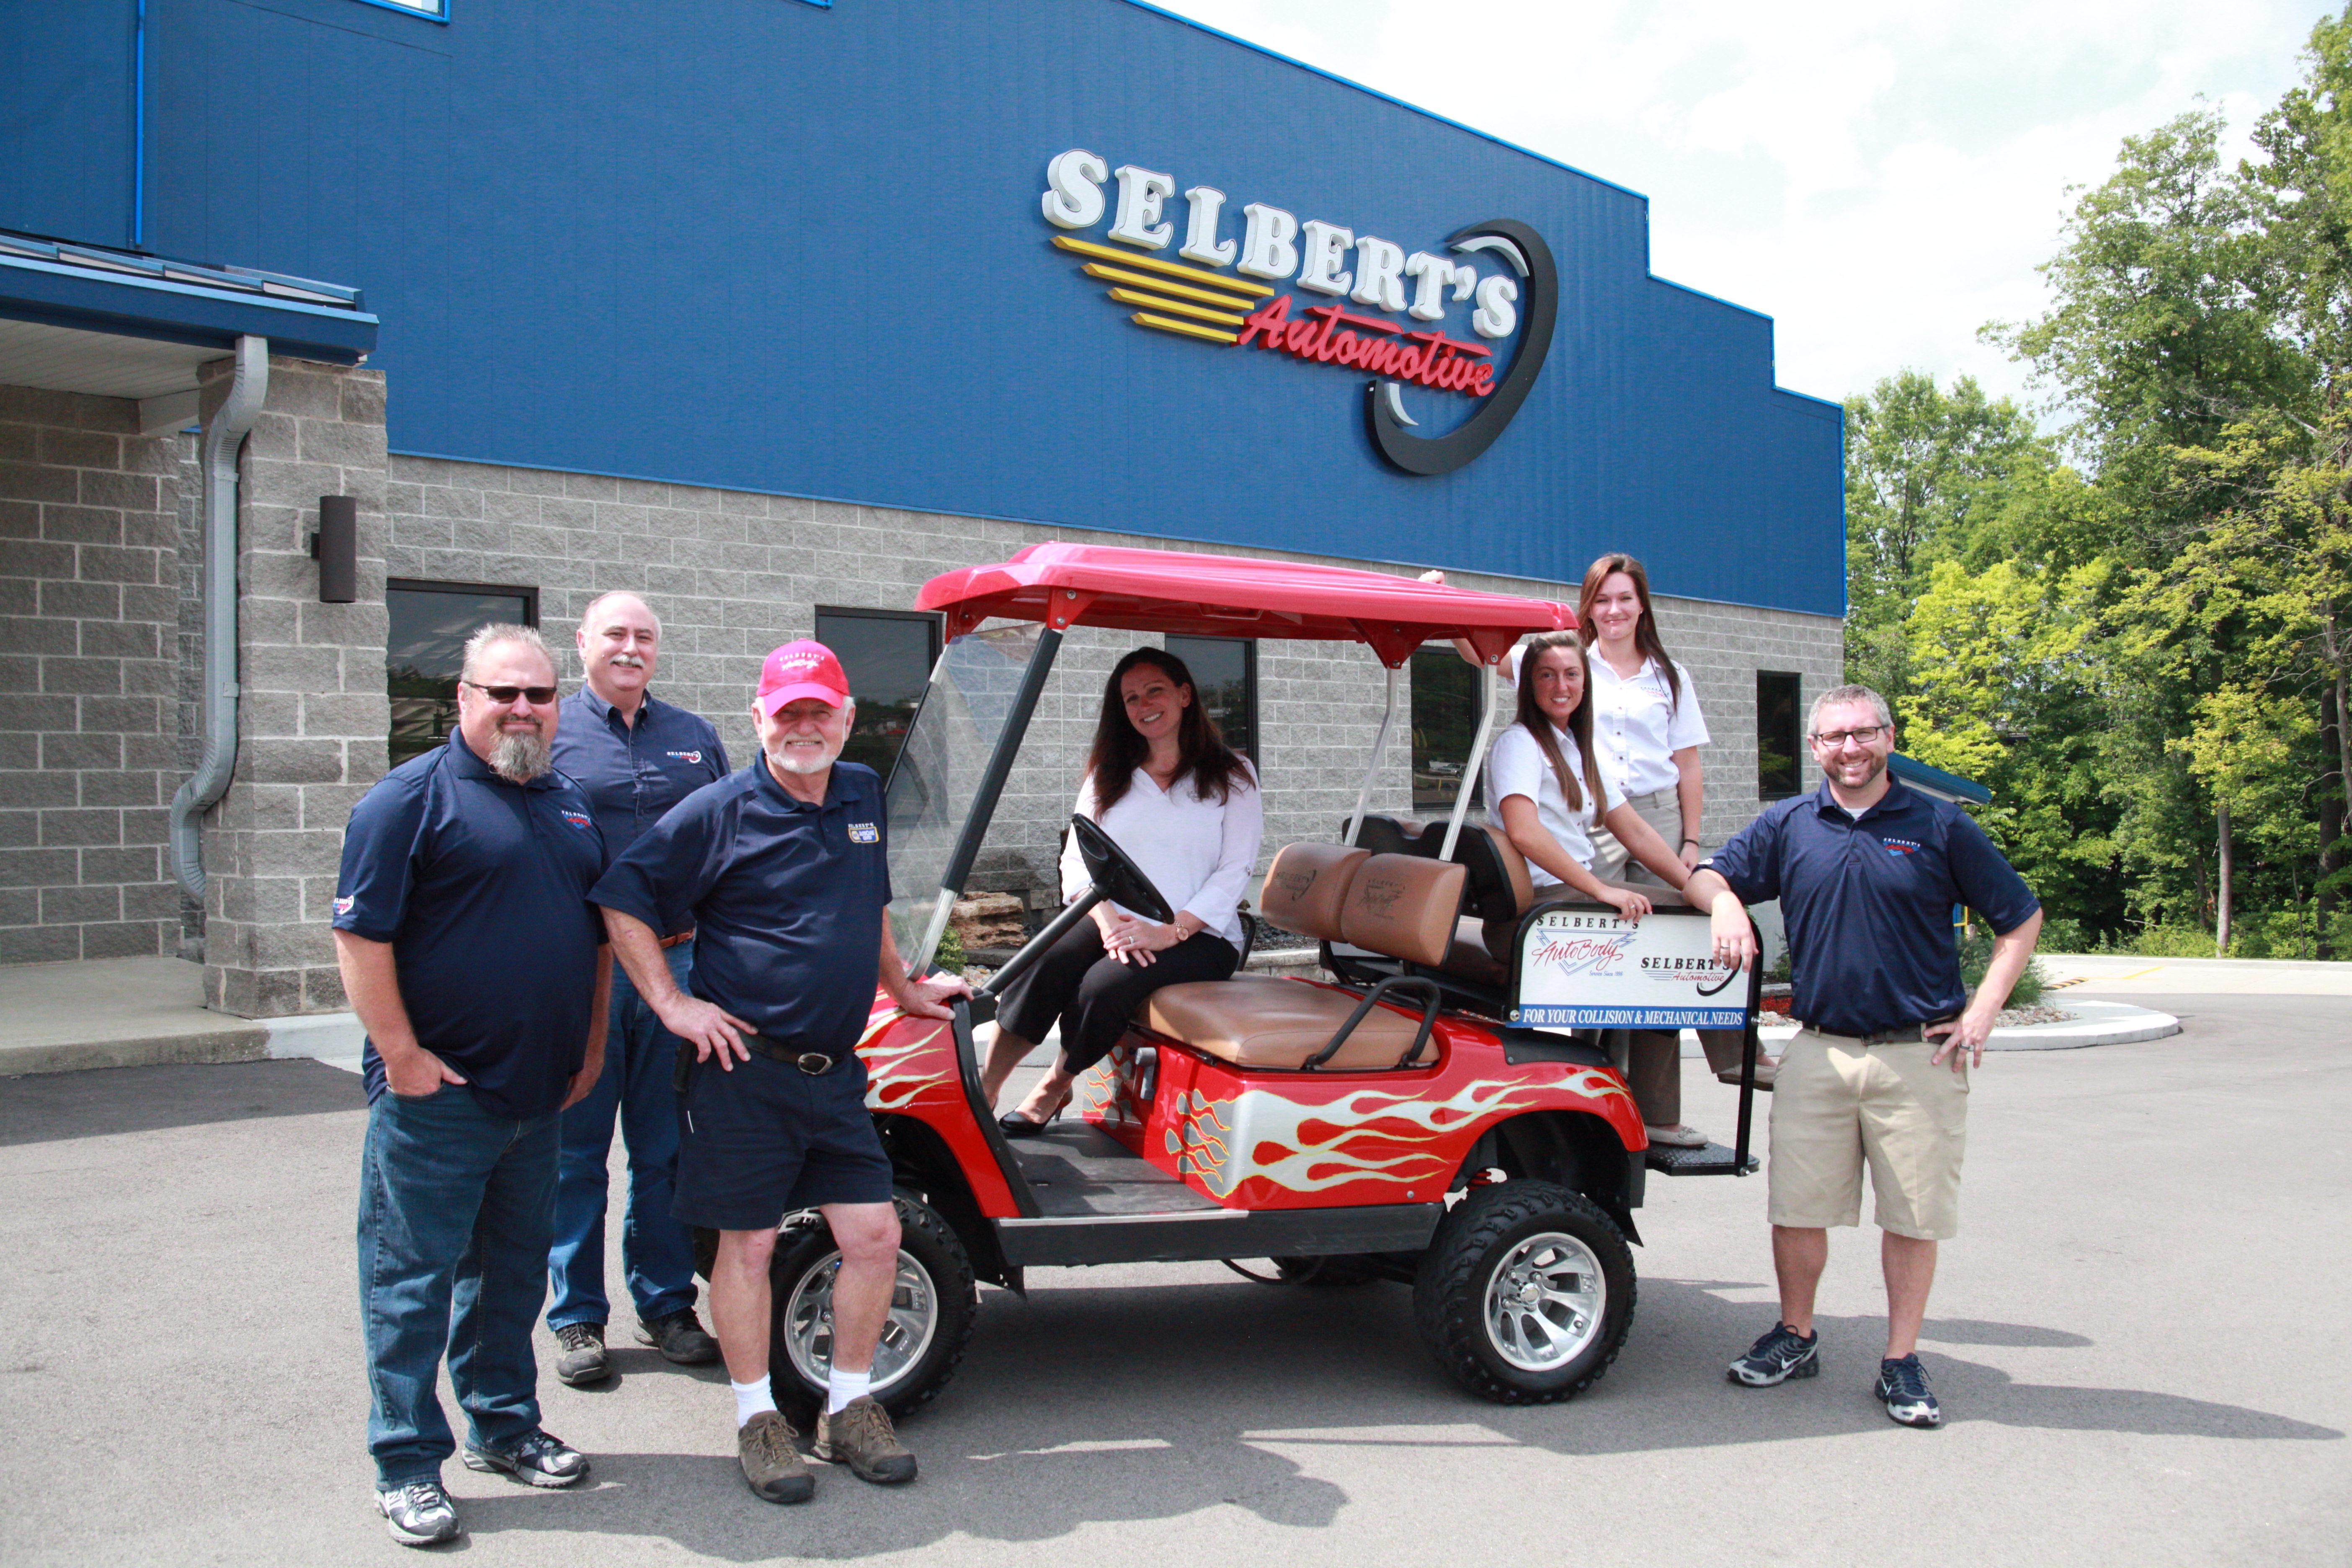 Selbert's team on golf cart